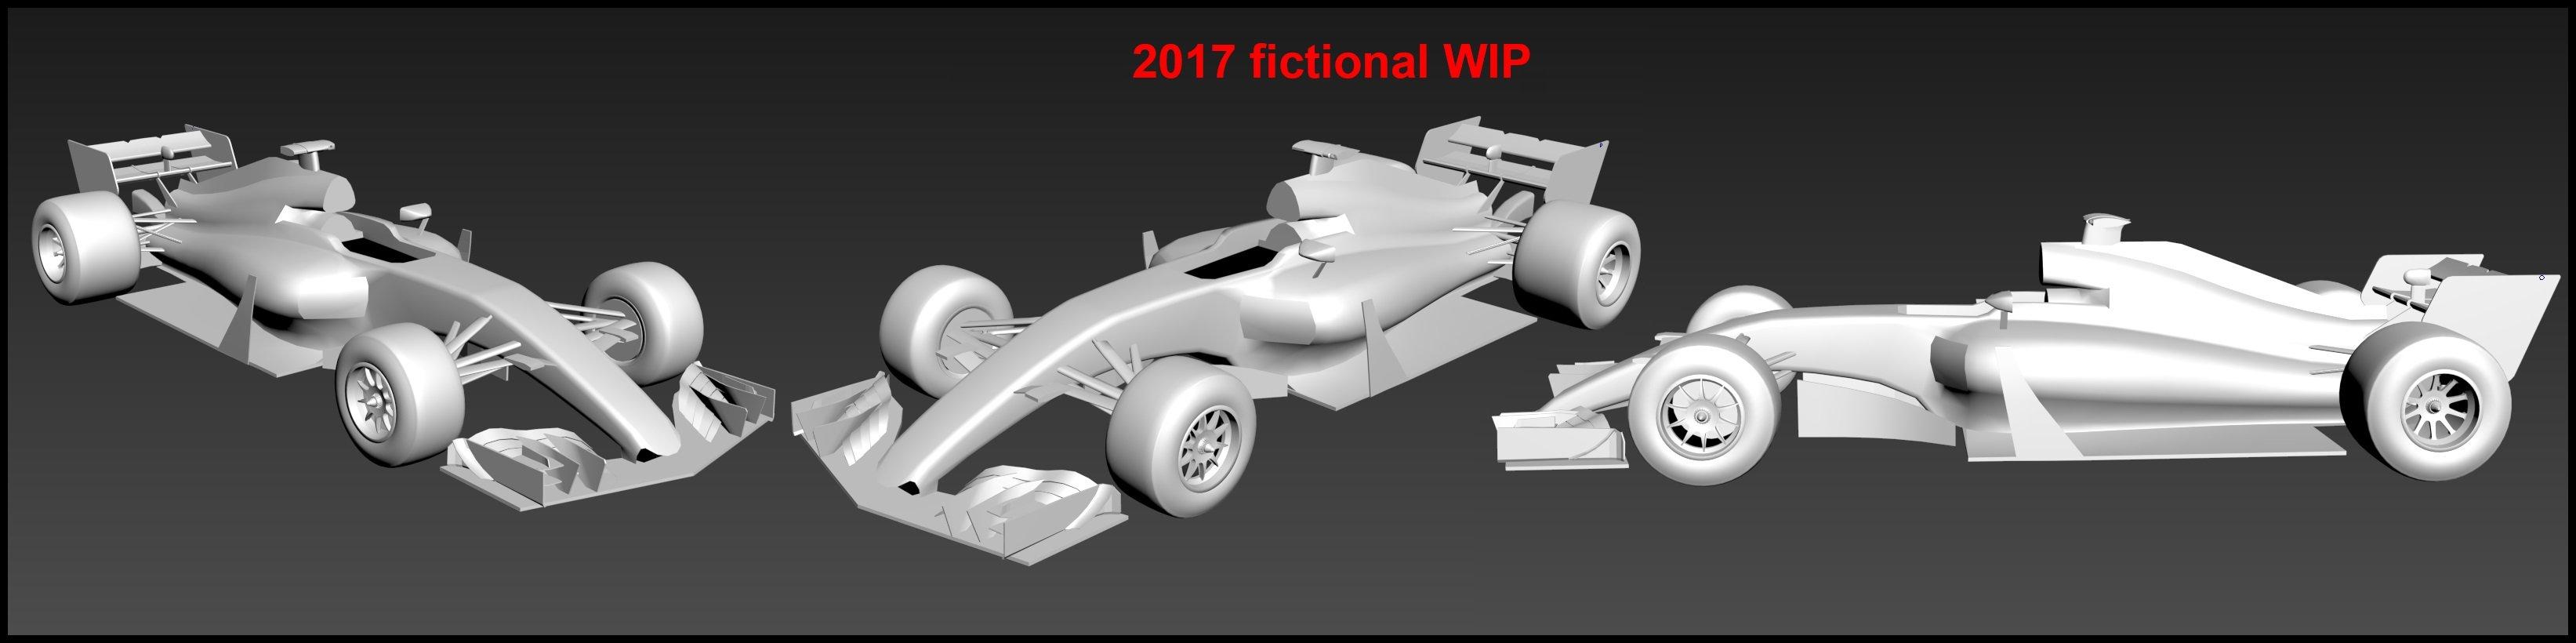 AMS-2017-Fictional-WIP